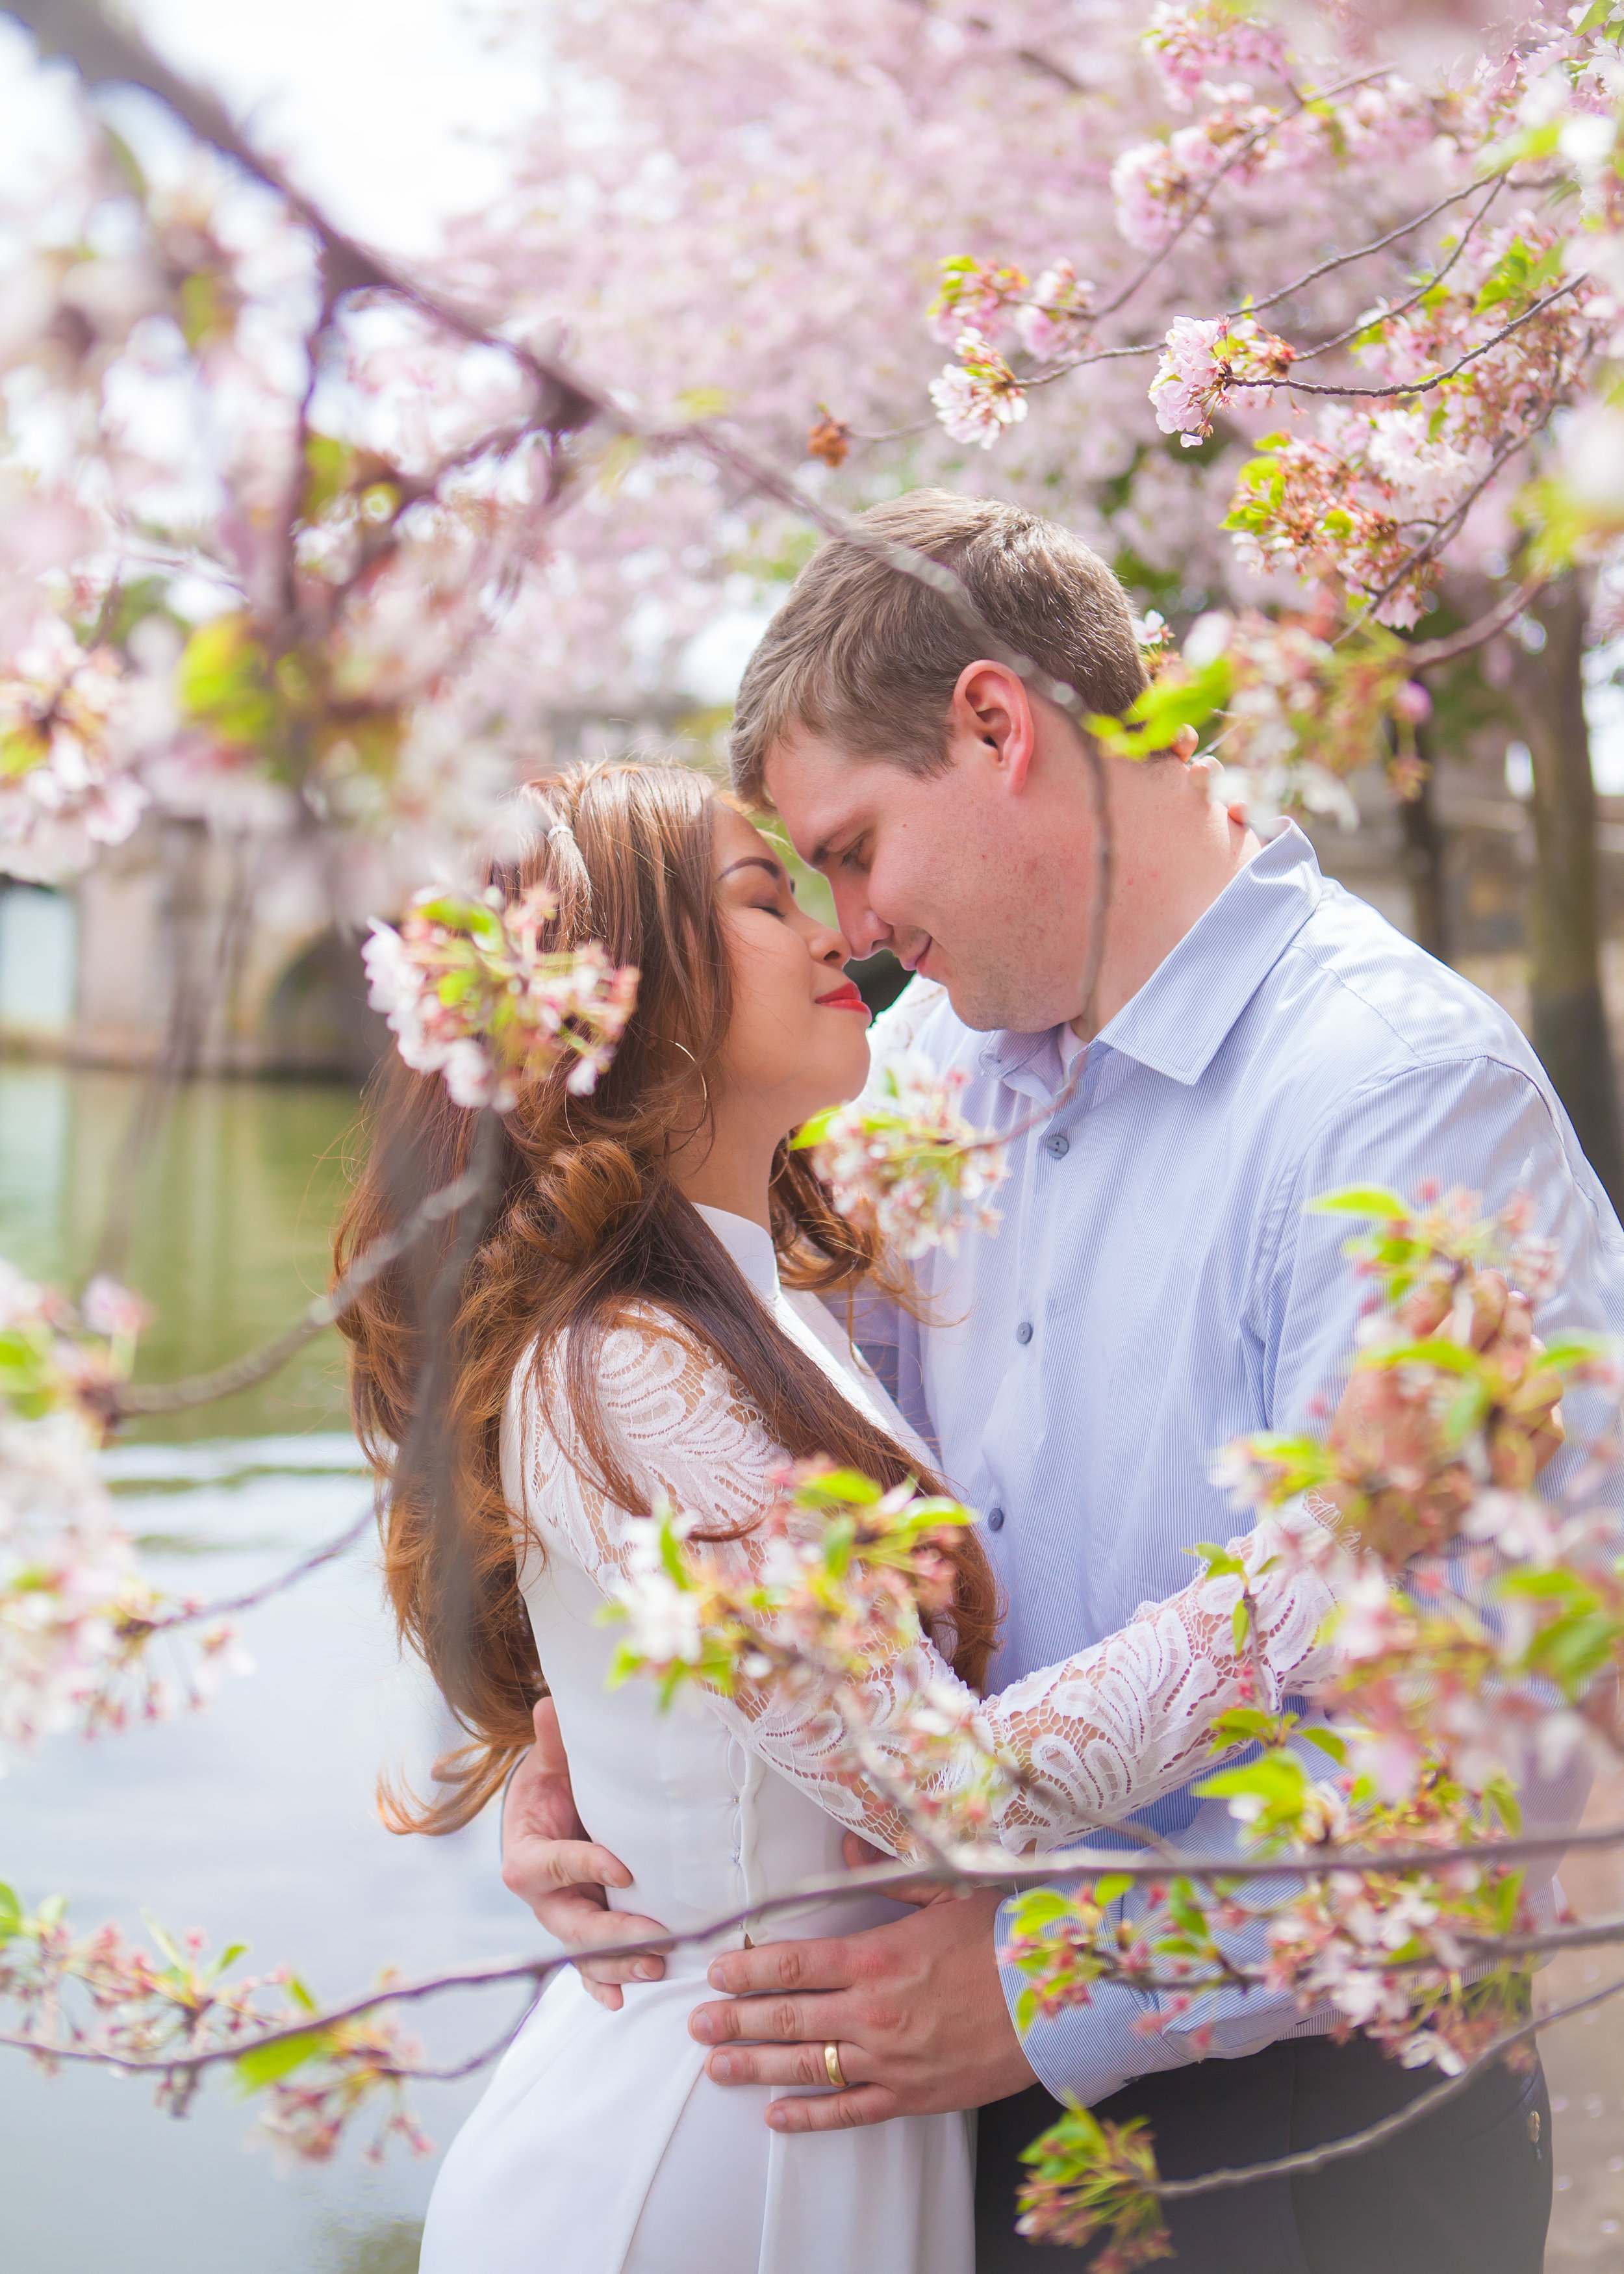 Steve & Ruby Cherry Blossom Portraits - 001.jpg